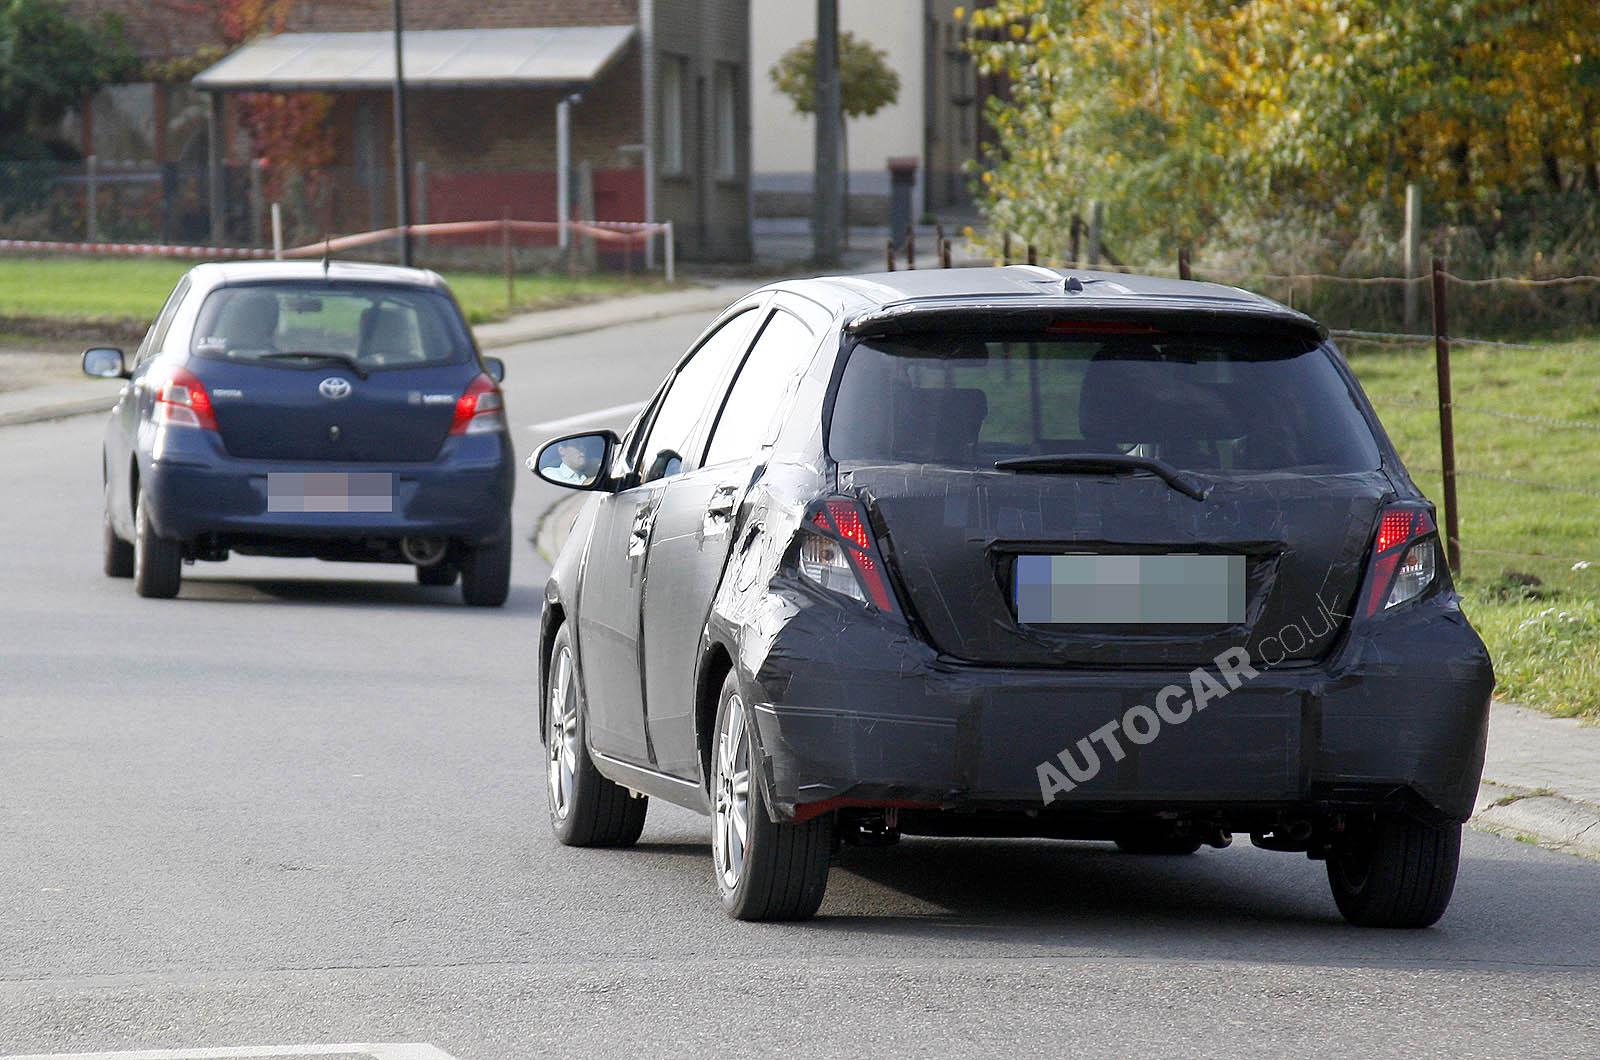 Toyota Yaris 2012 года: вид сзади.